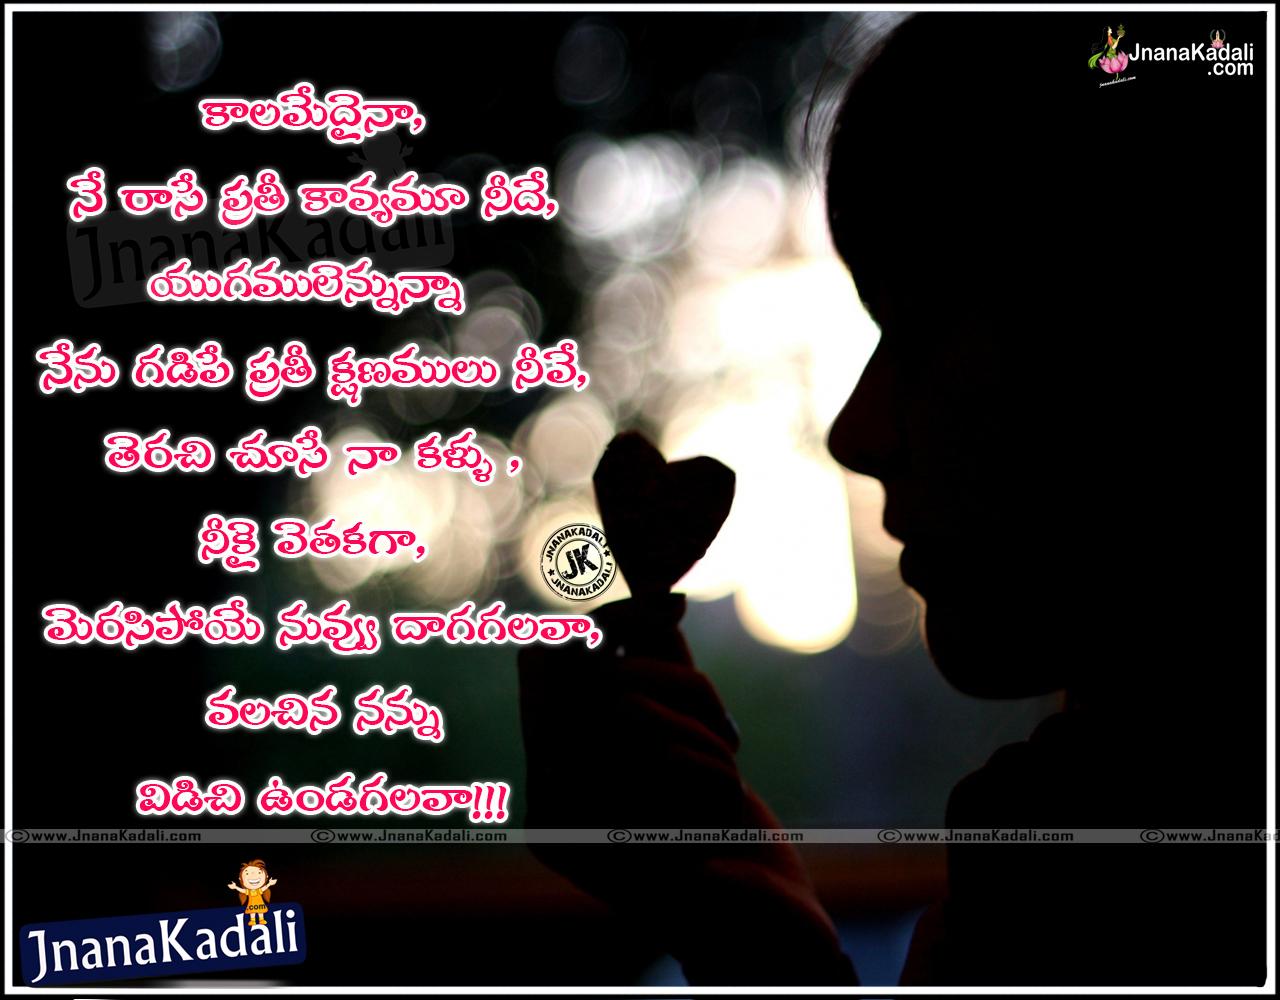 Peachy Heart Touching Telugu Love Quotes Jnana Kadali Com Telugu Personalised Birthday Cards Bromeletsinfo